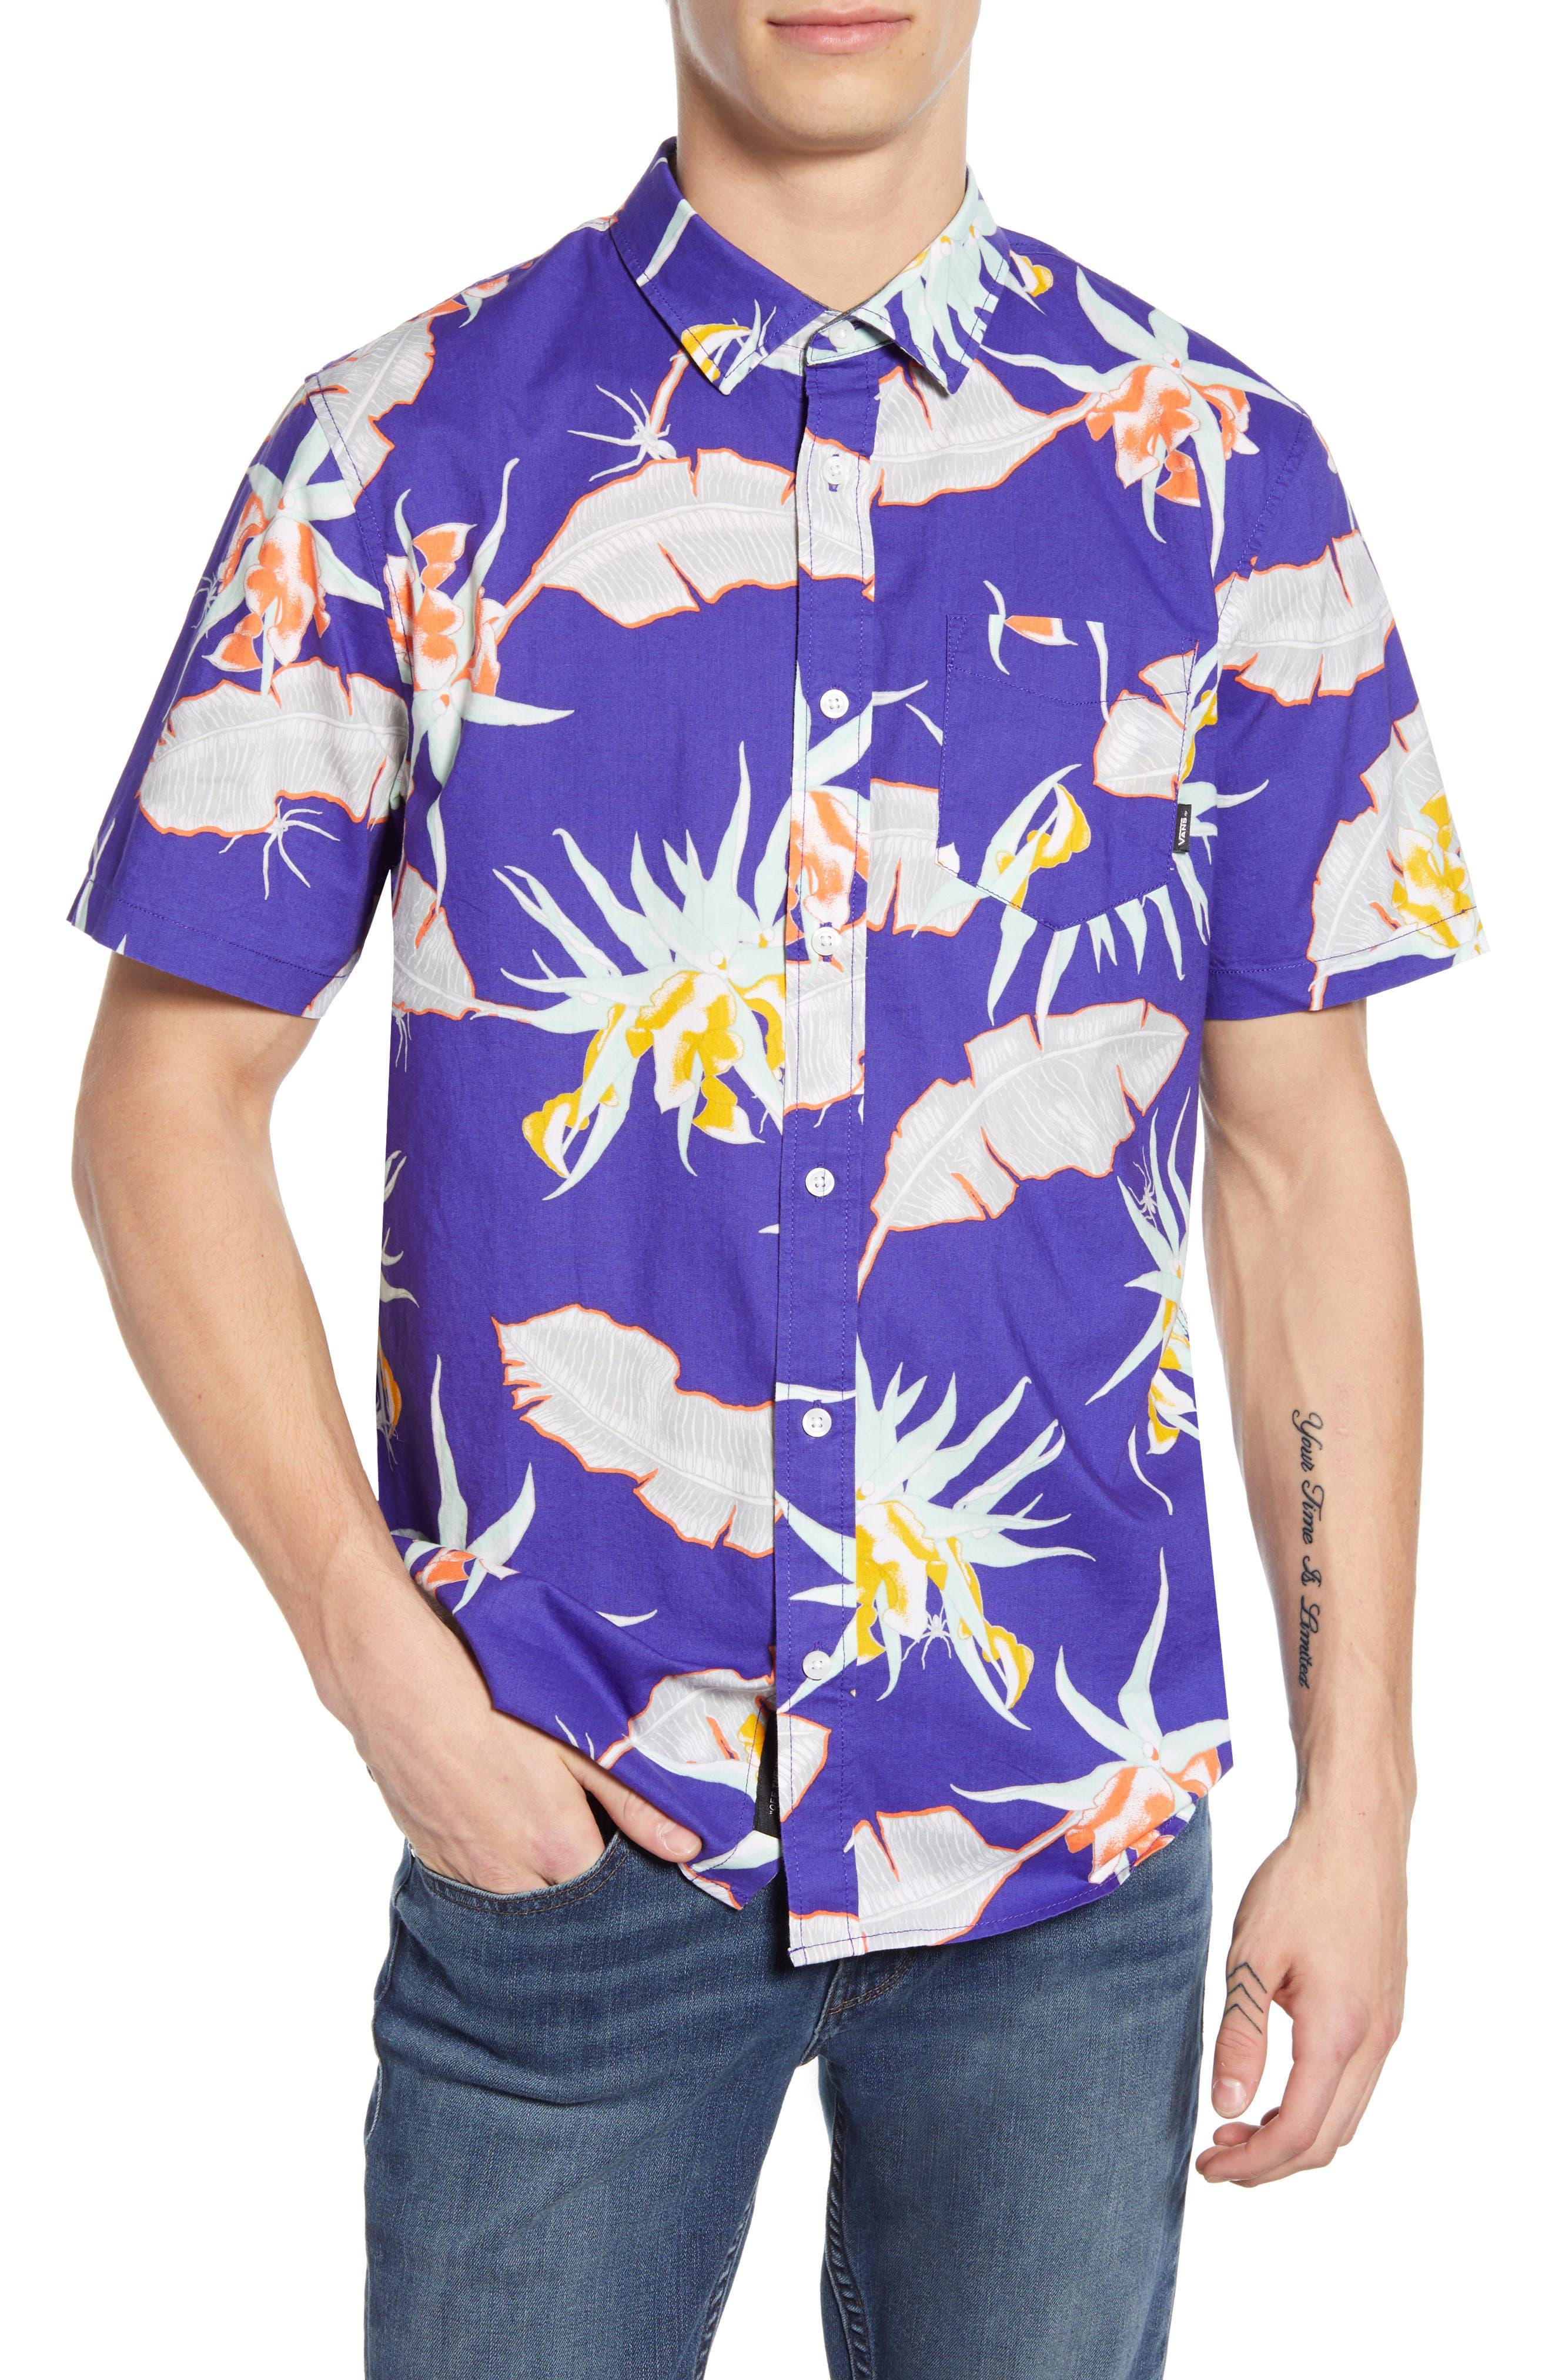 Arachnofloria Print Shirt, Main, color, VANS PURPLE